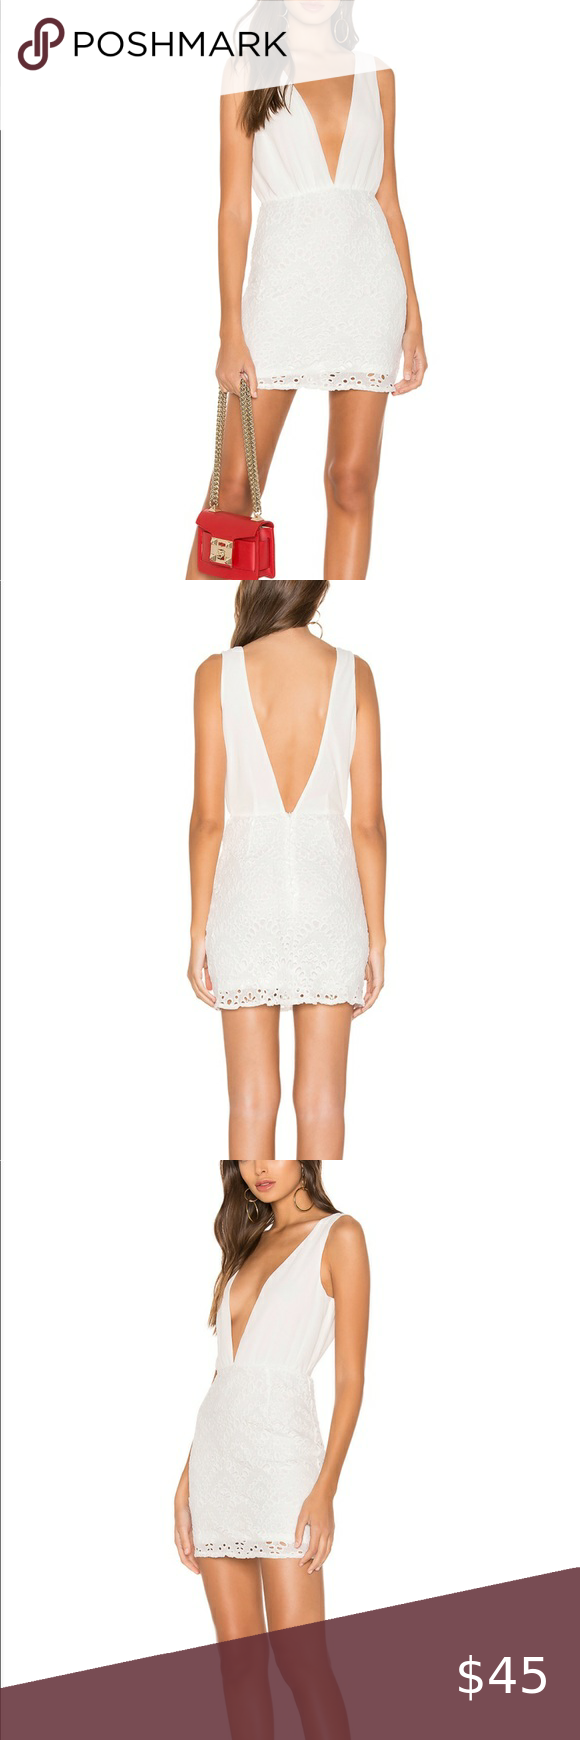 Revolve Superdown White Plunge Dress With Eyelet White Plunge Dress Plunge Dress Dresses [ 1740 x 580 Pixel ]